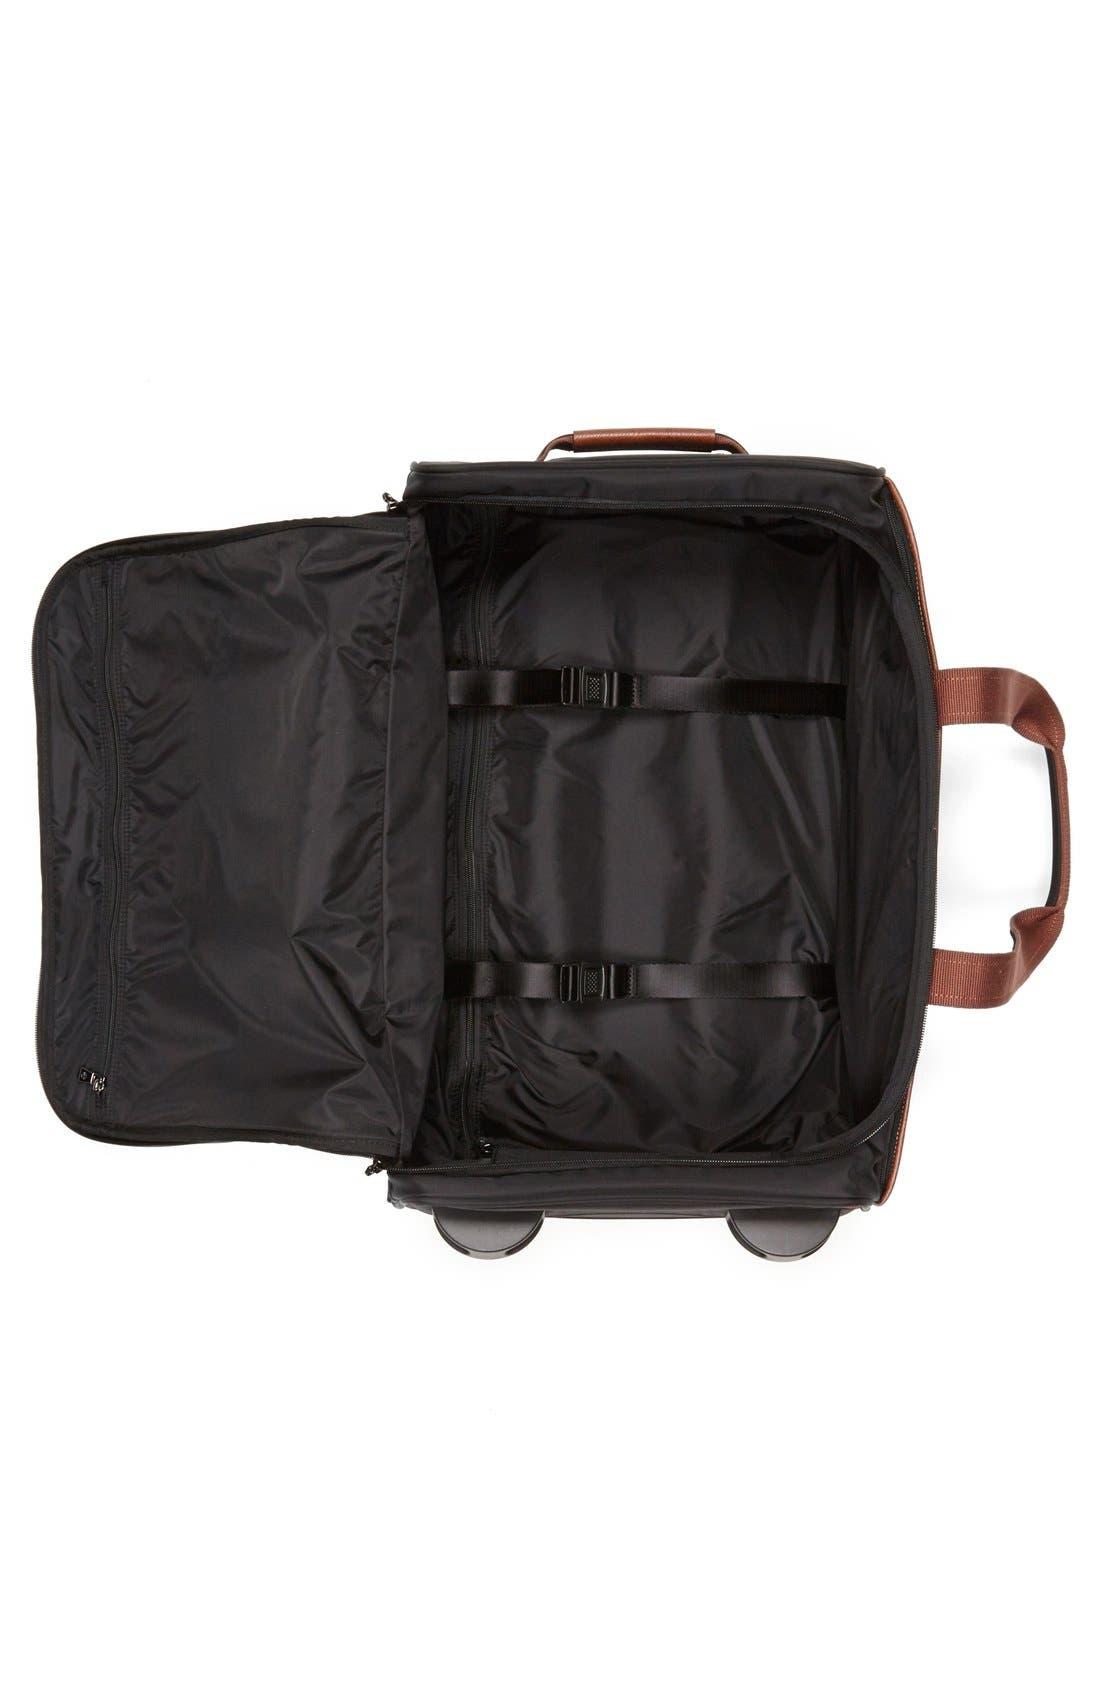 'Small Le Pliage' Wheeled Travel Bag,                             Alternate thumbnail 2, color,                             001